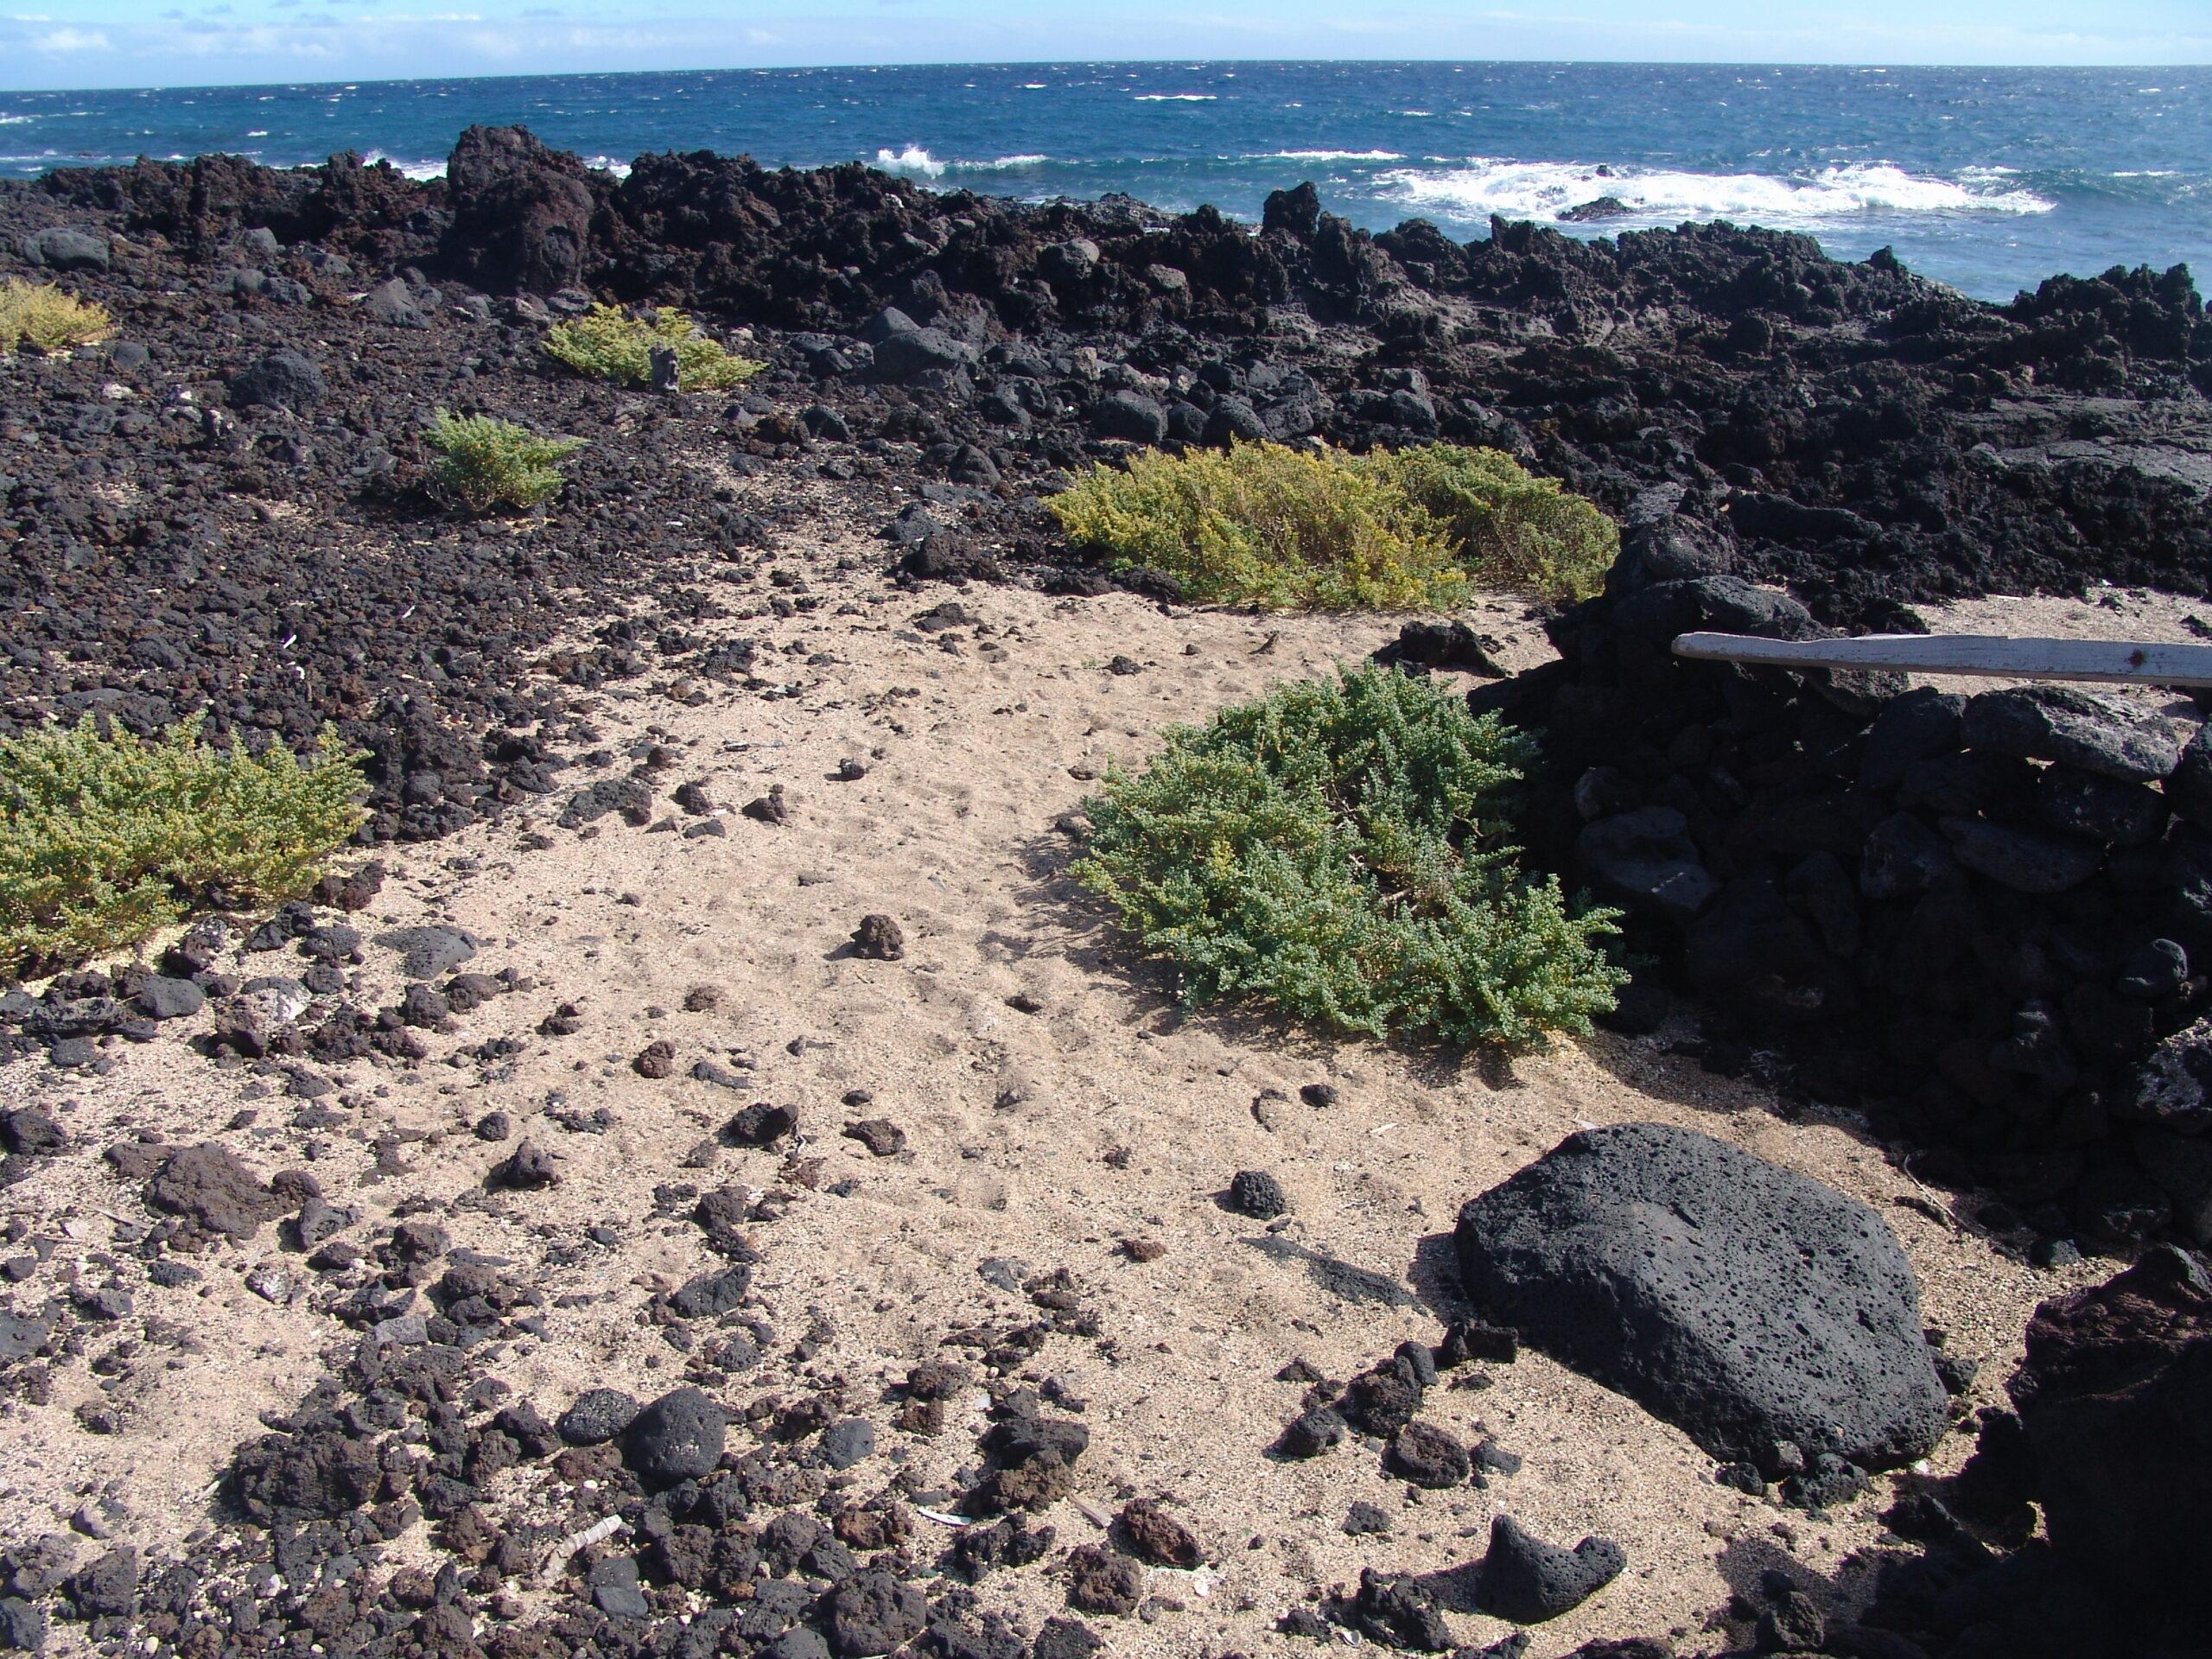 dsc04419-habitat-malpais-de-guimar-2-scaled.jpg